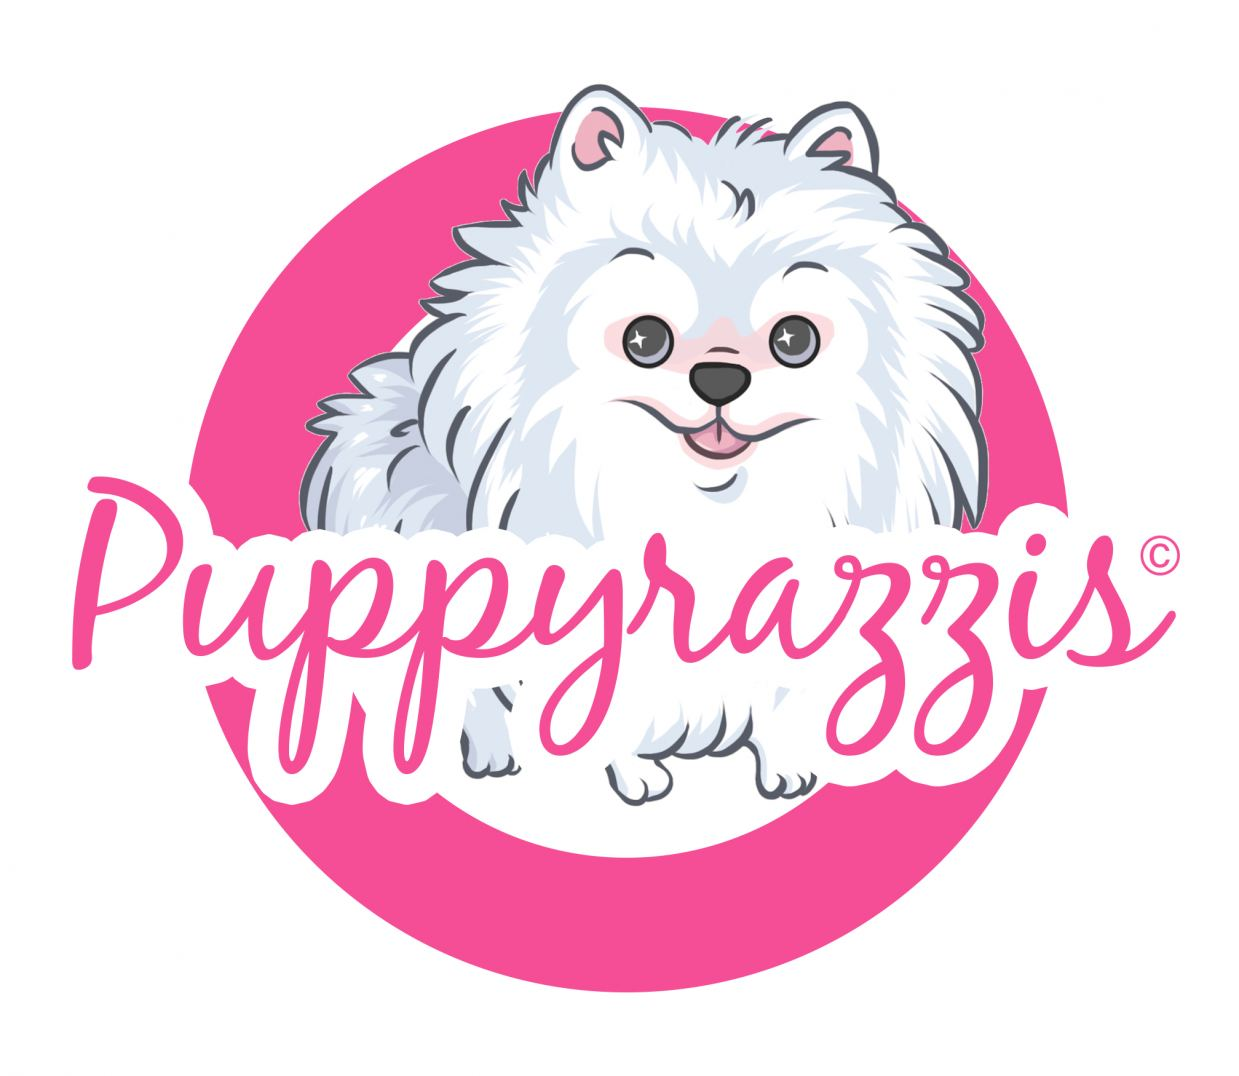 PUPPYRAZZIS Logo